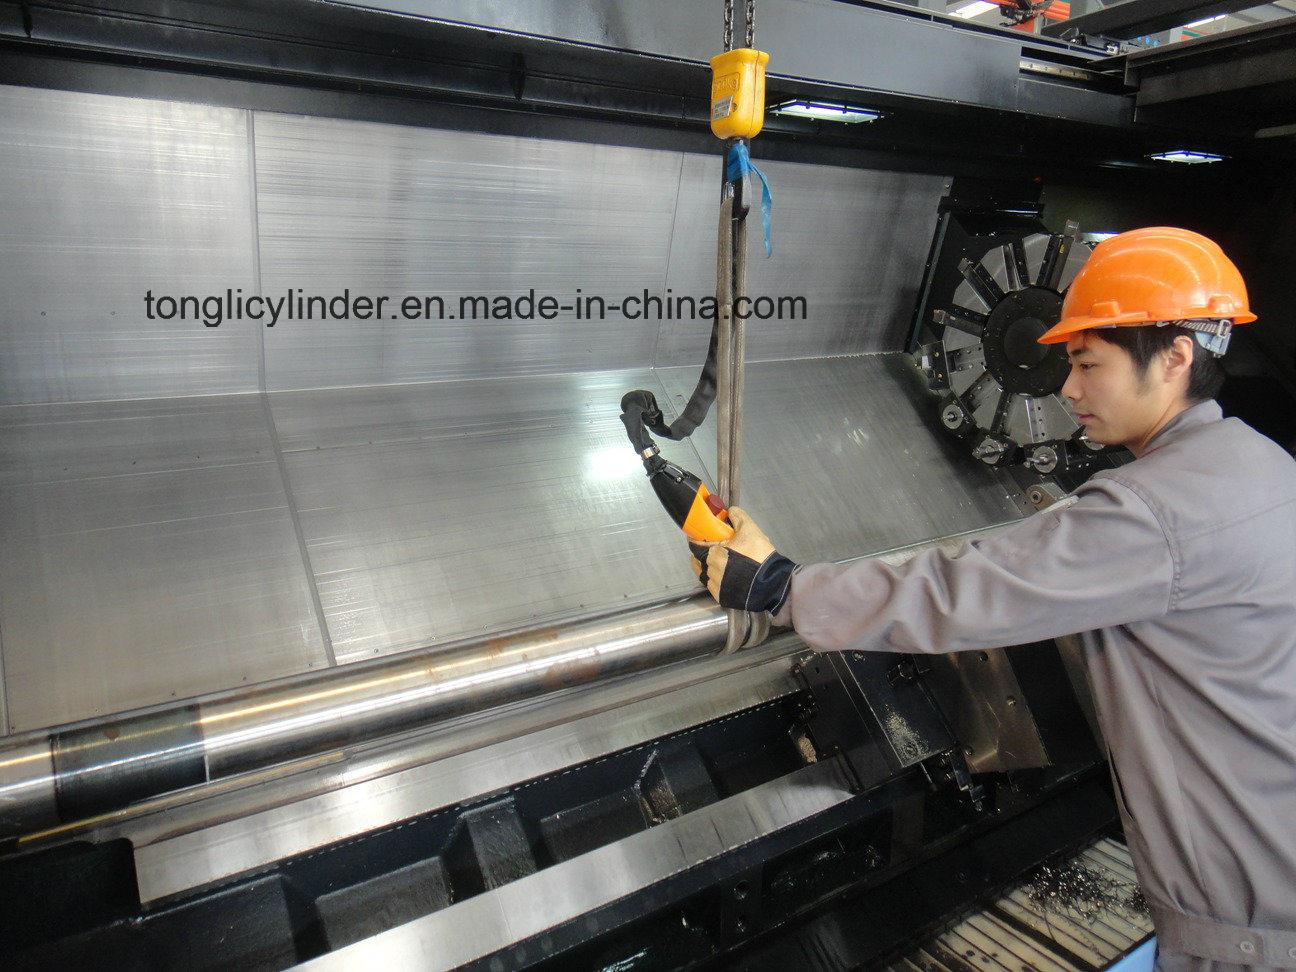 Dh500 Boom Cylinder /Hydraulic Cylinder of Doosan Excavator